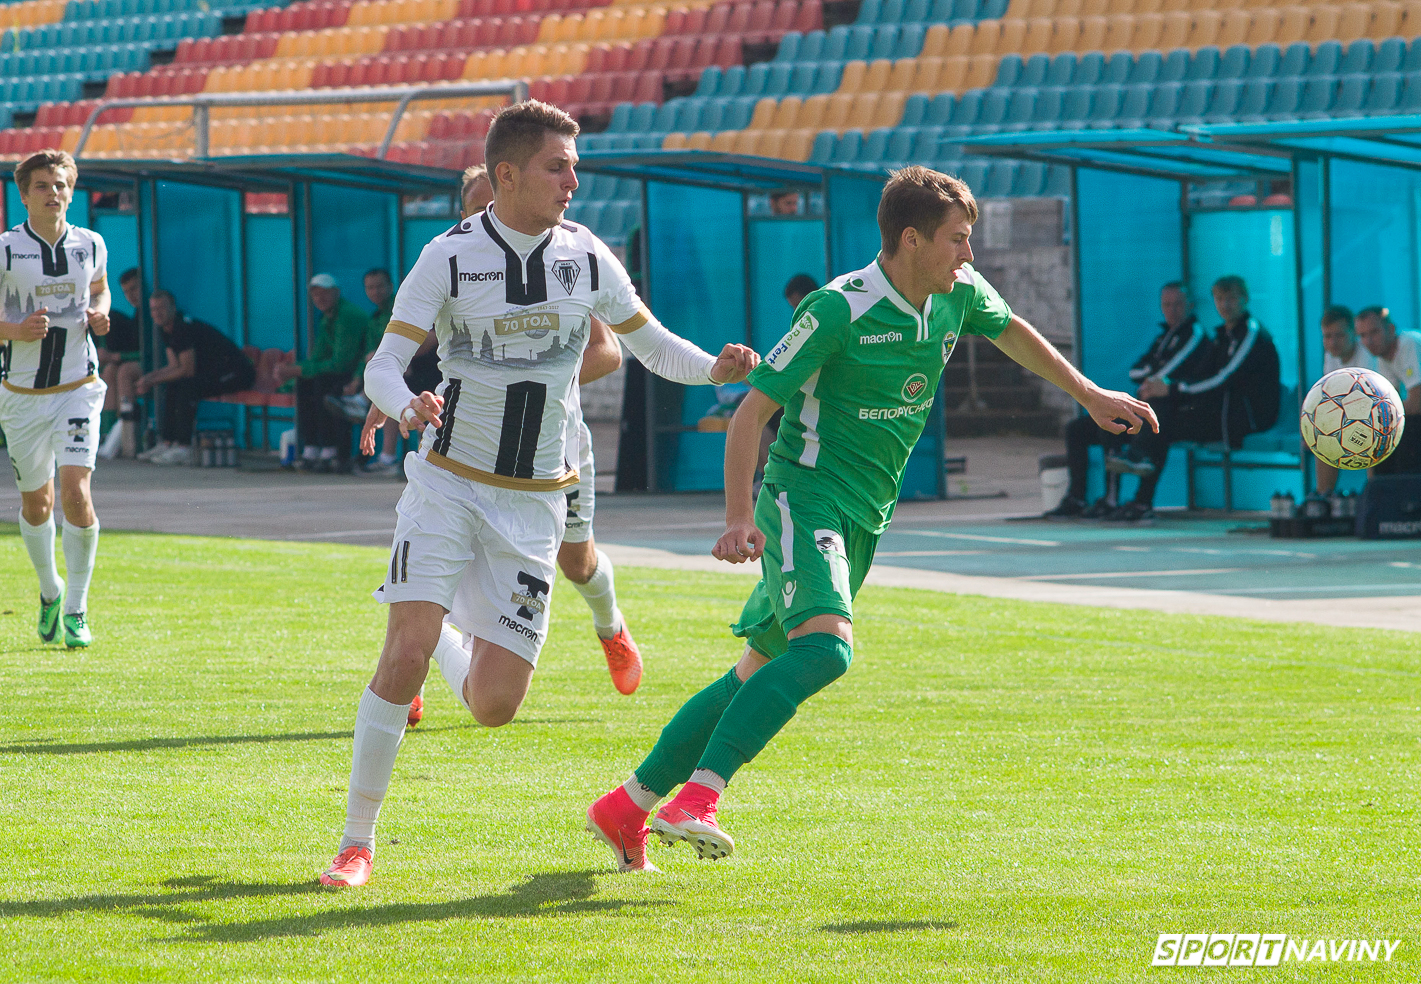 FC Torpedo-Minsk - FC Gomel. 09/07/2017. Belarus Cup